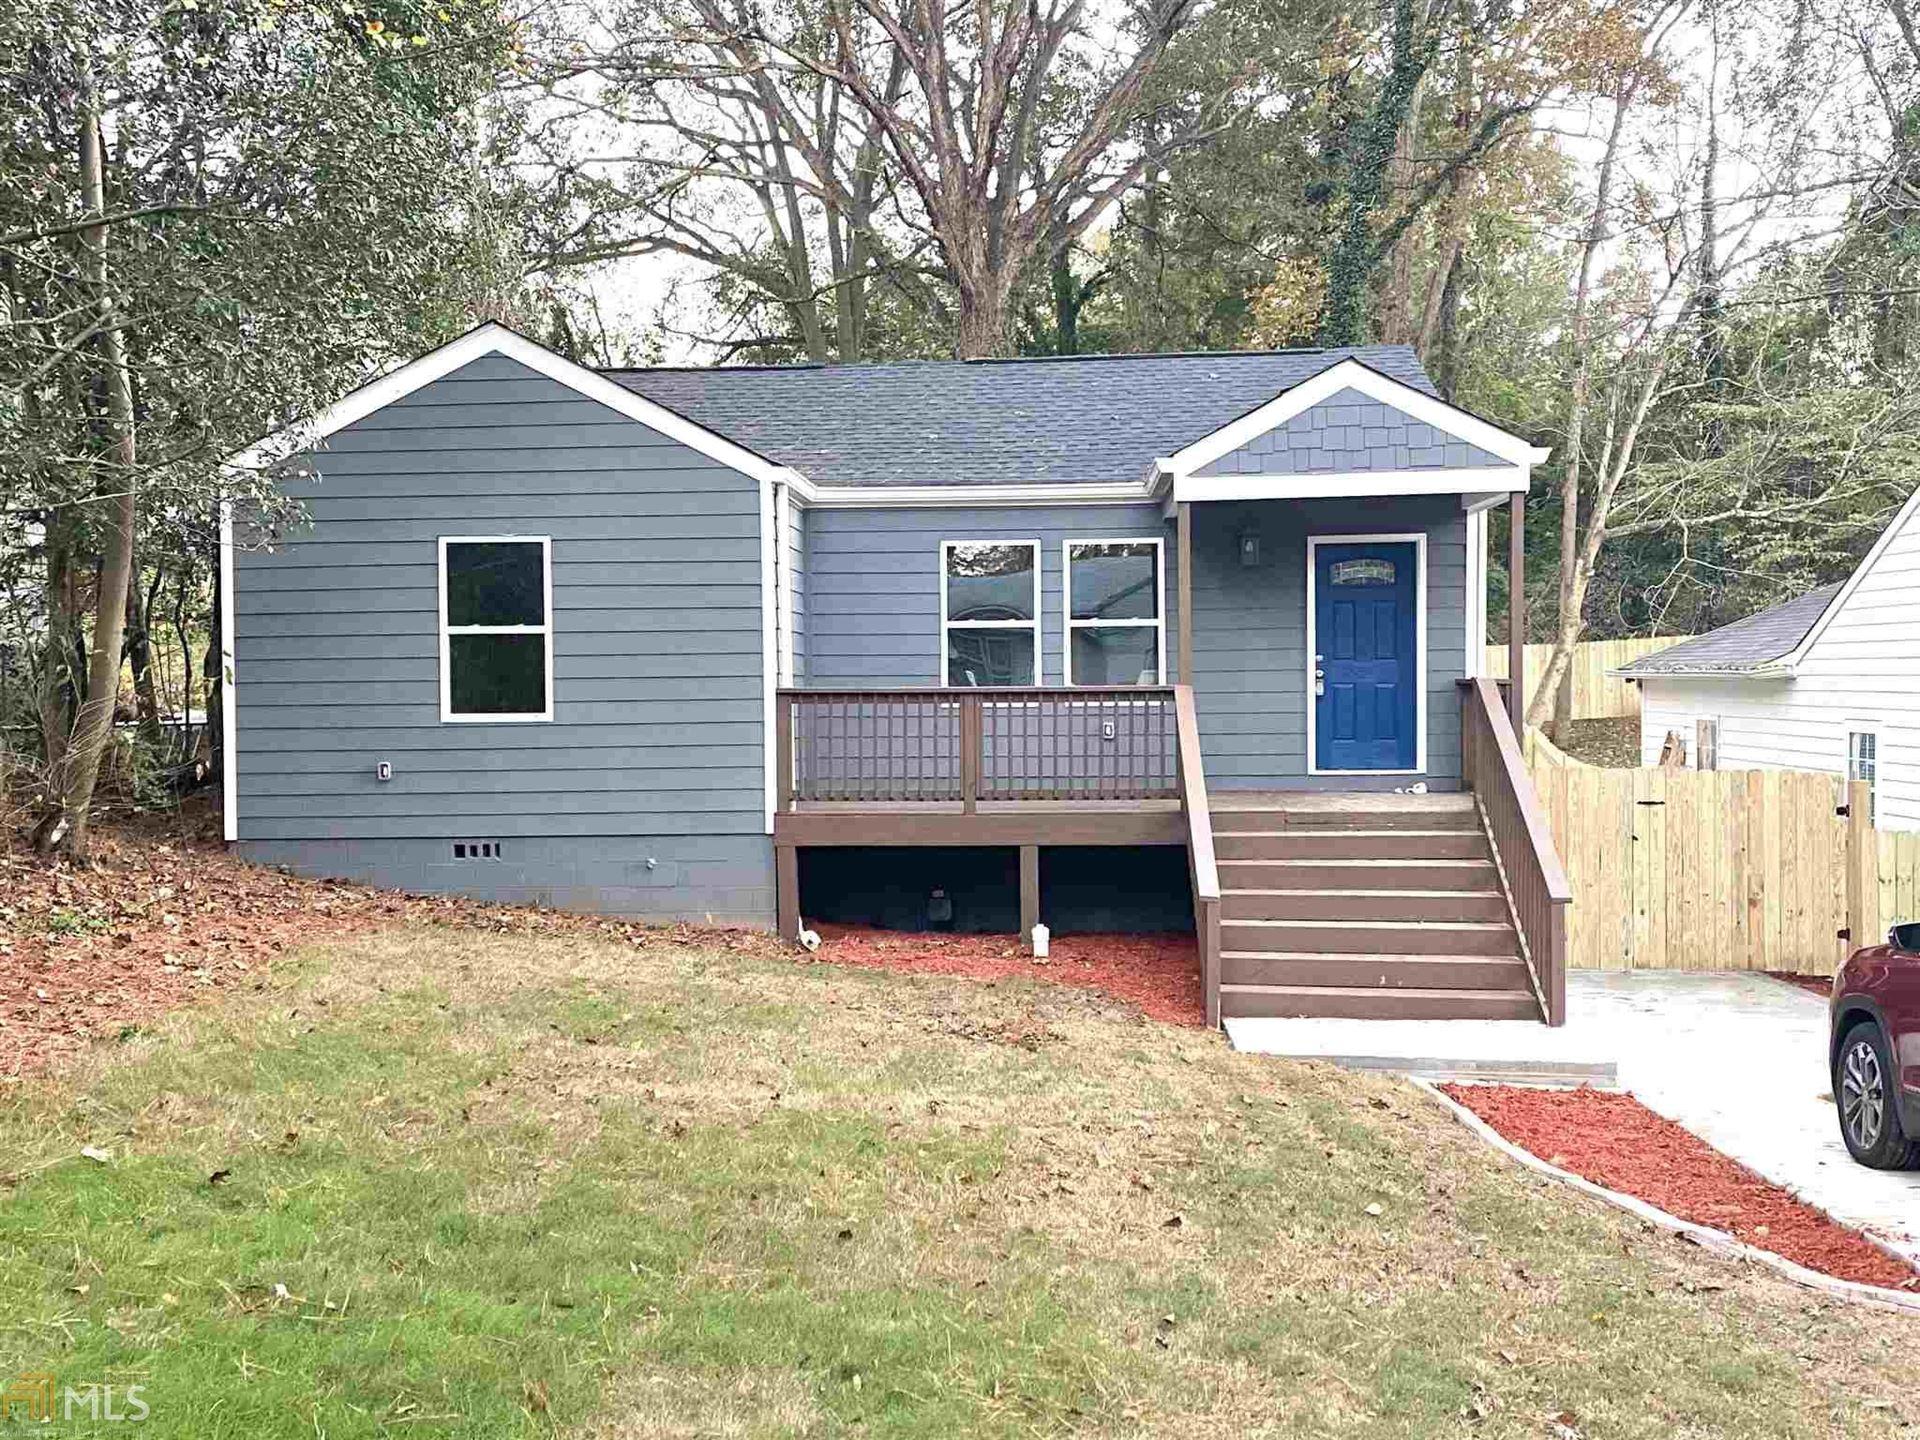 1779 Pennington, Atlanta, GA 30316 - MLS#: 8869430